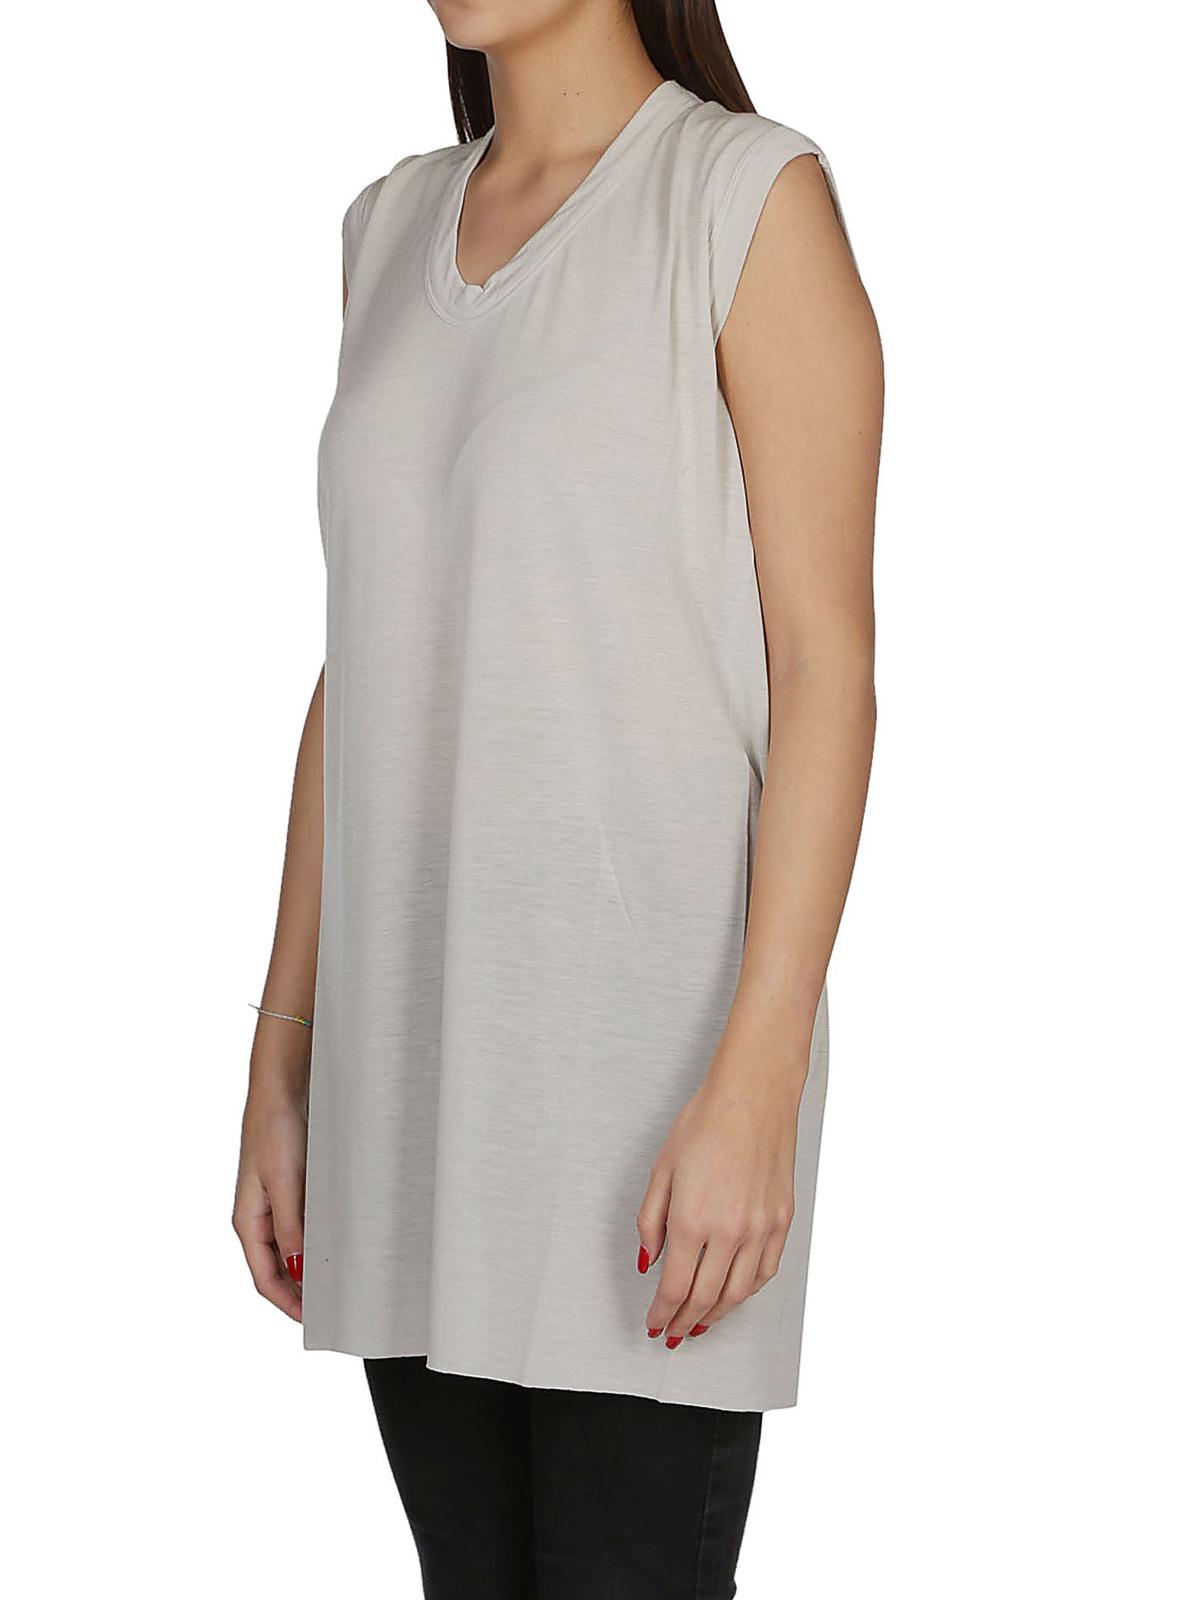 e7156f09e8bfca RICK OWENS HUN  Tops   Tank tops online - V-neck white silk blend